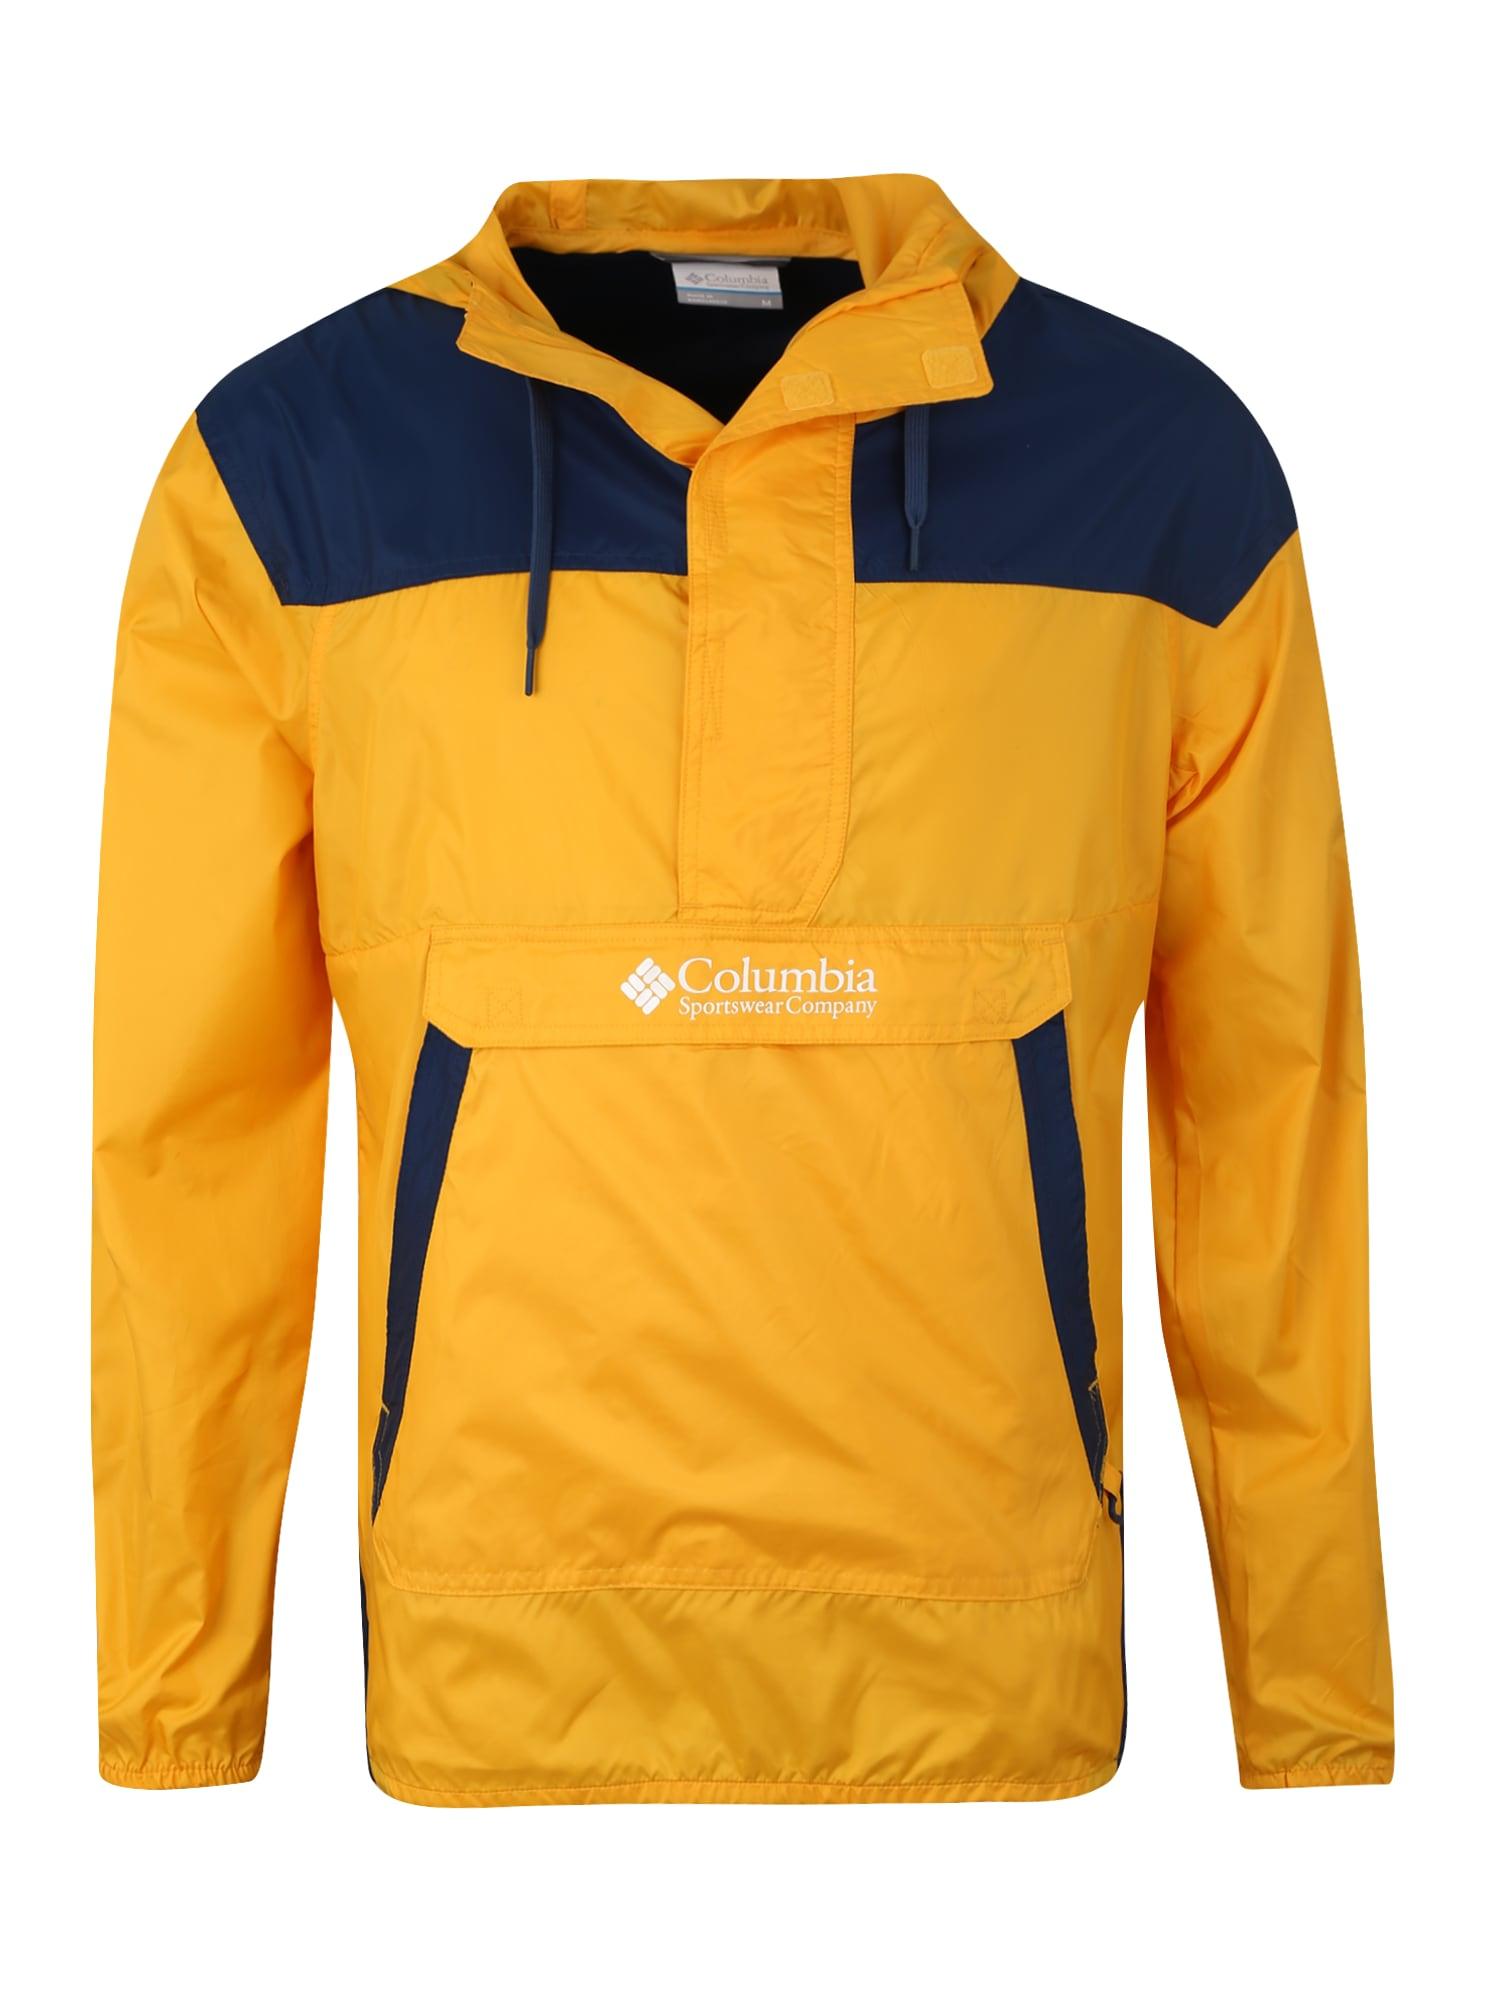 Outdoorová bunda Challenger žlutá černá COLUMBIA